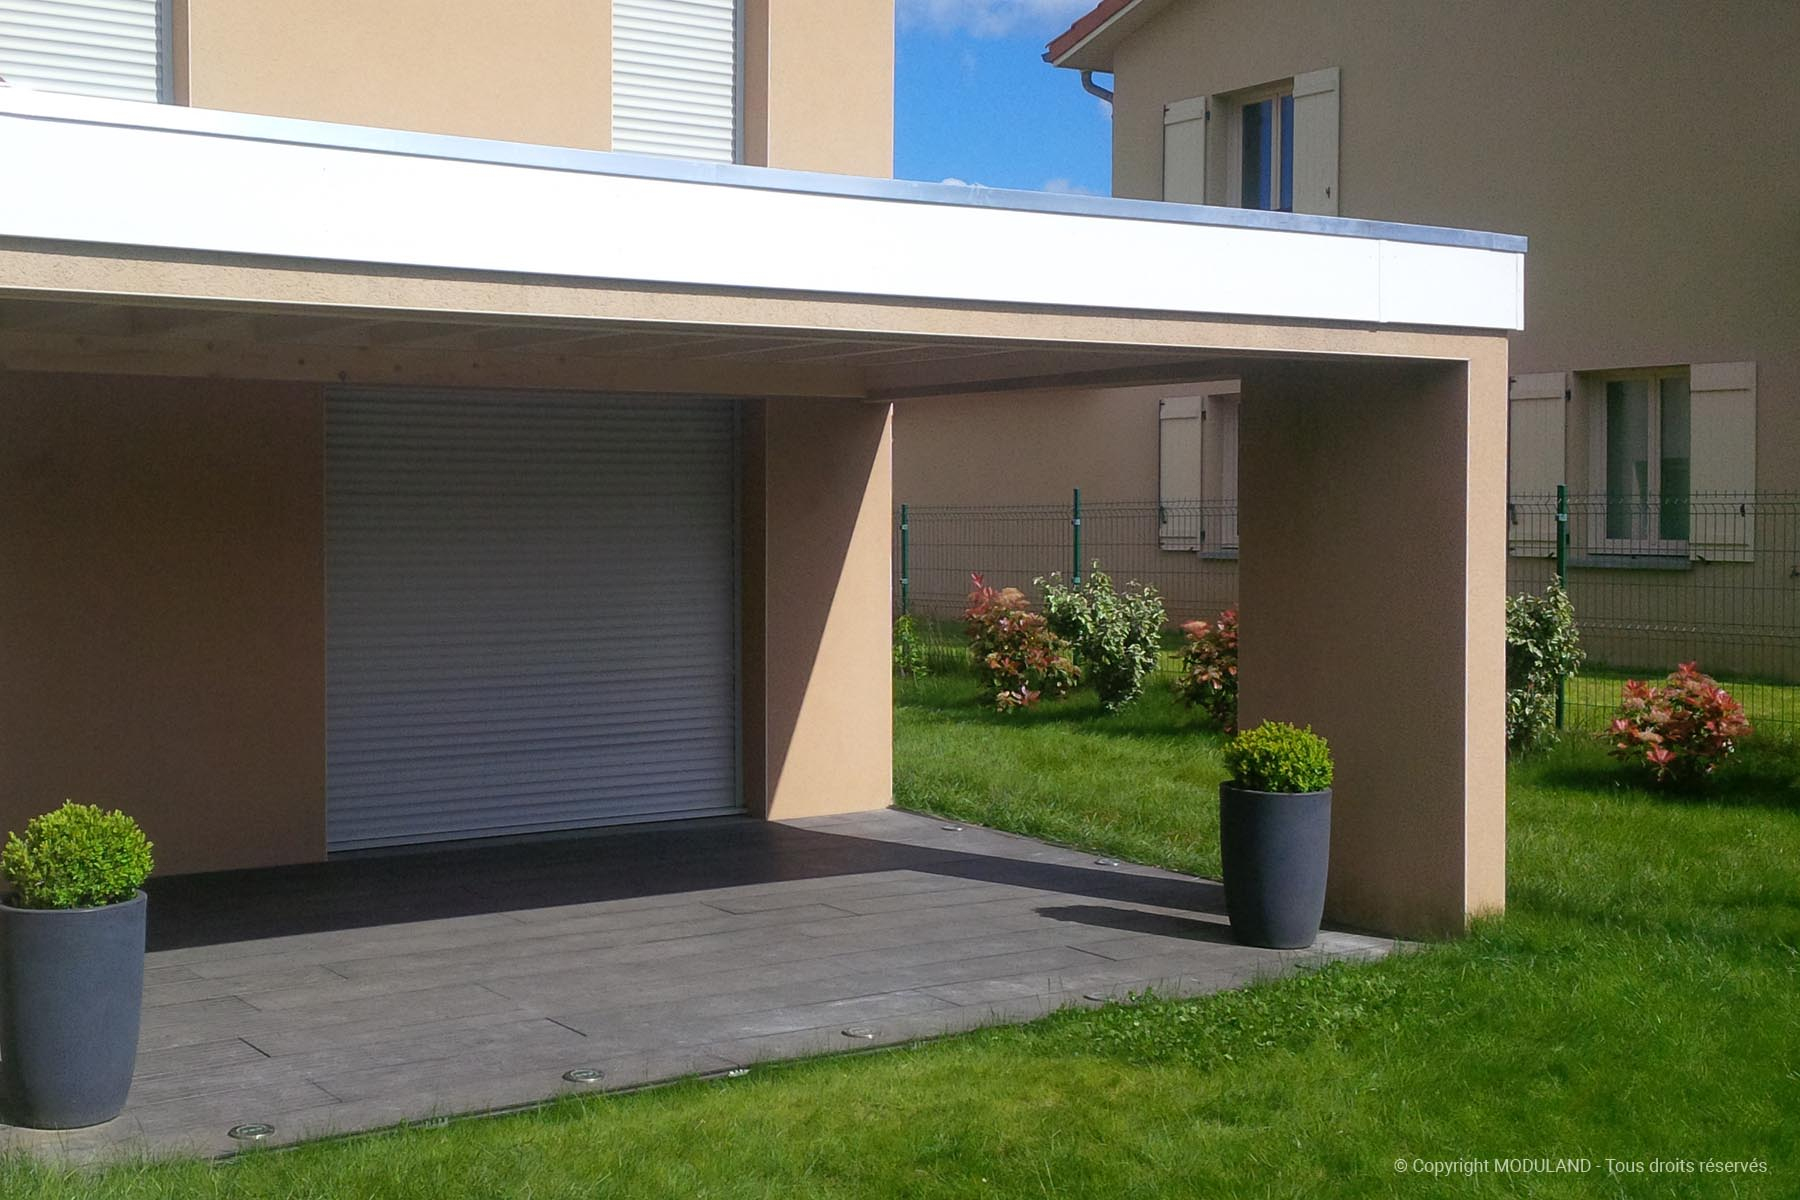 Auvent Terrasse Thonon | Moduland concernant Abri De Jardin Thonon